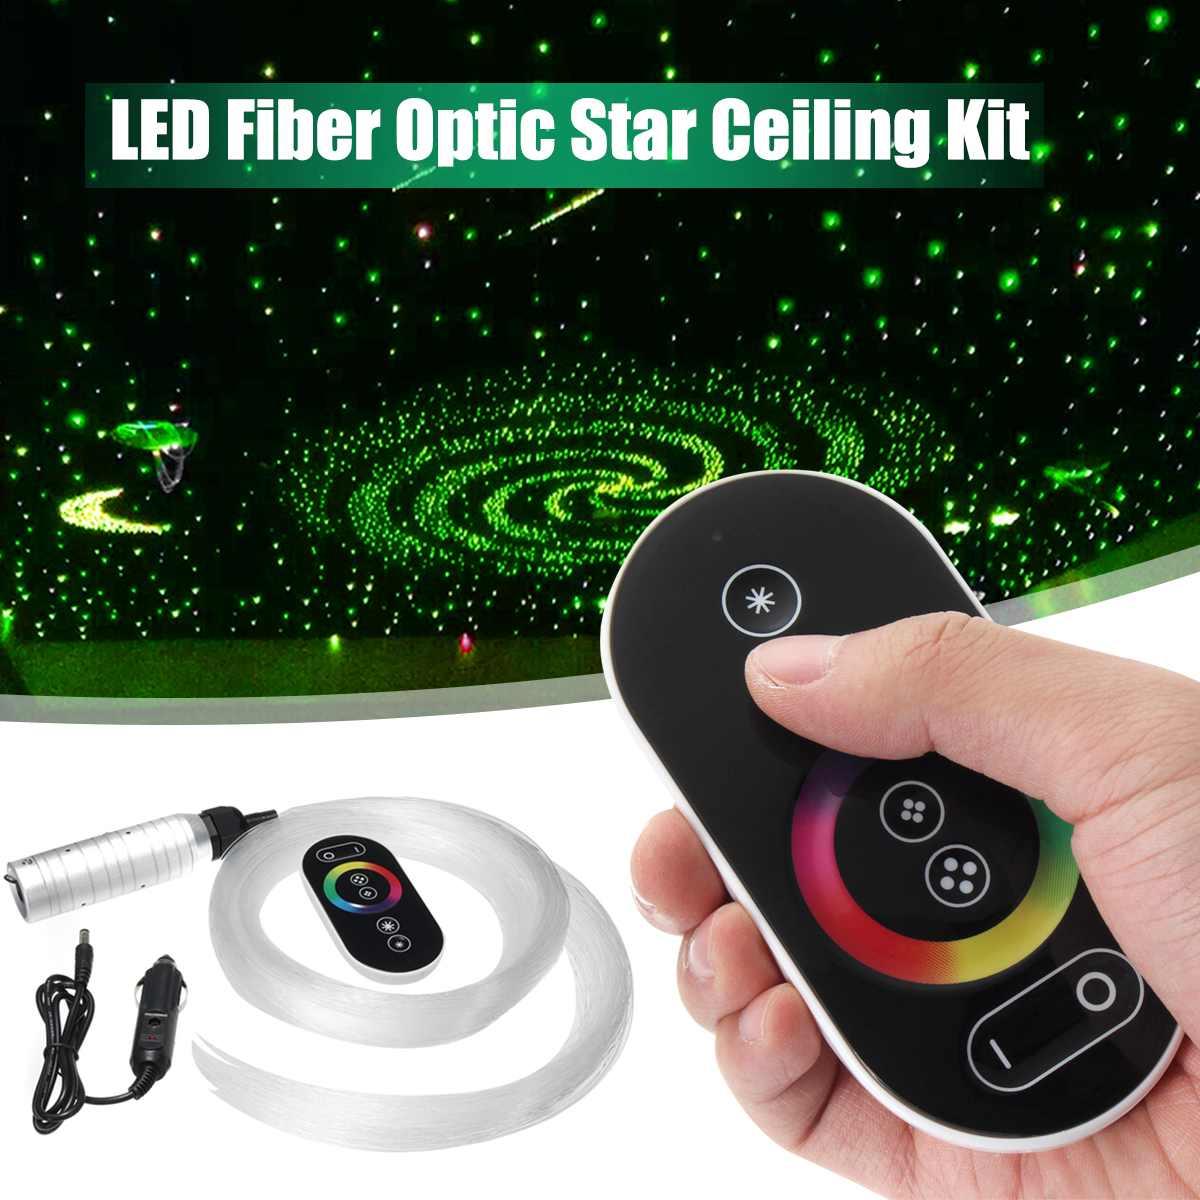 12V 6W RGB LED Fiber Optic Star Ceiling Engine Sky Ceiling Kit Light 150Pcs 0.75m 2m Optical Fiber Twinkle W/28 Key Wireless RF